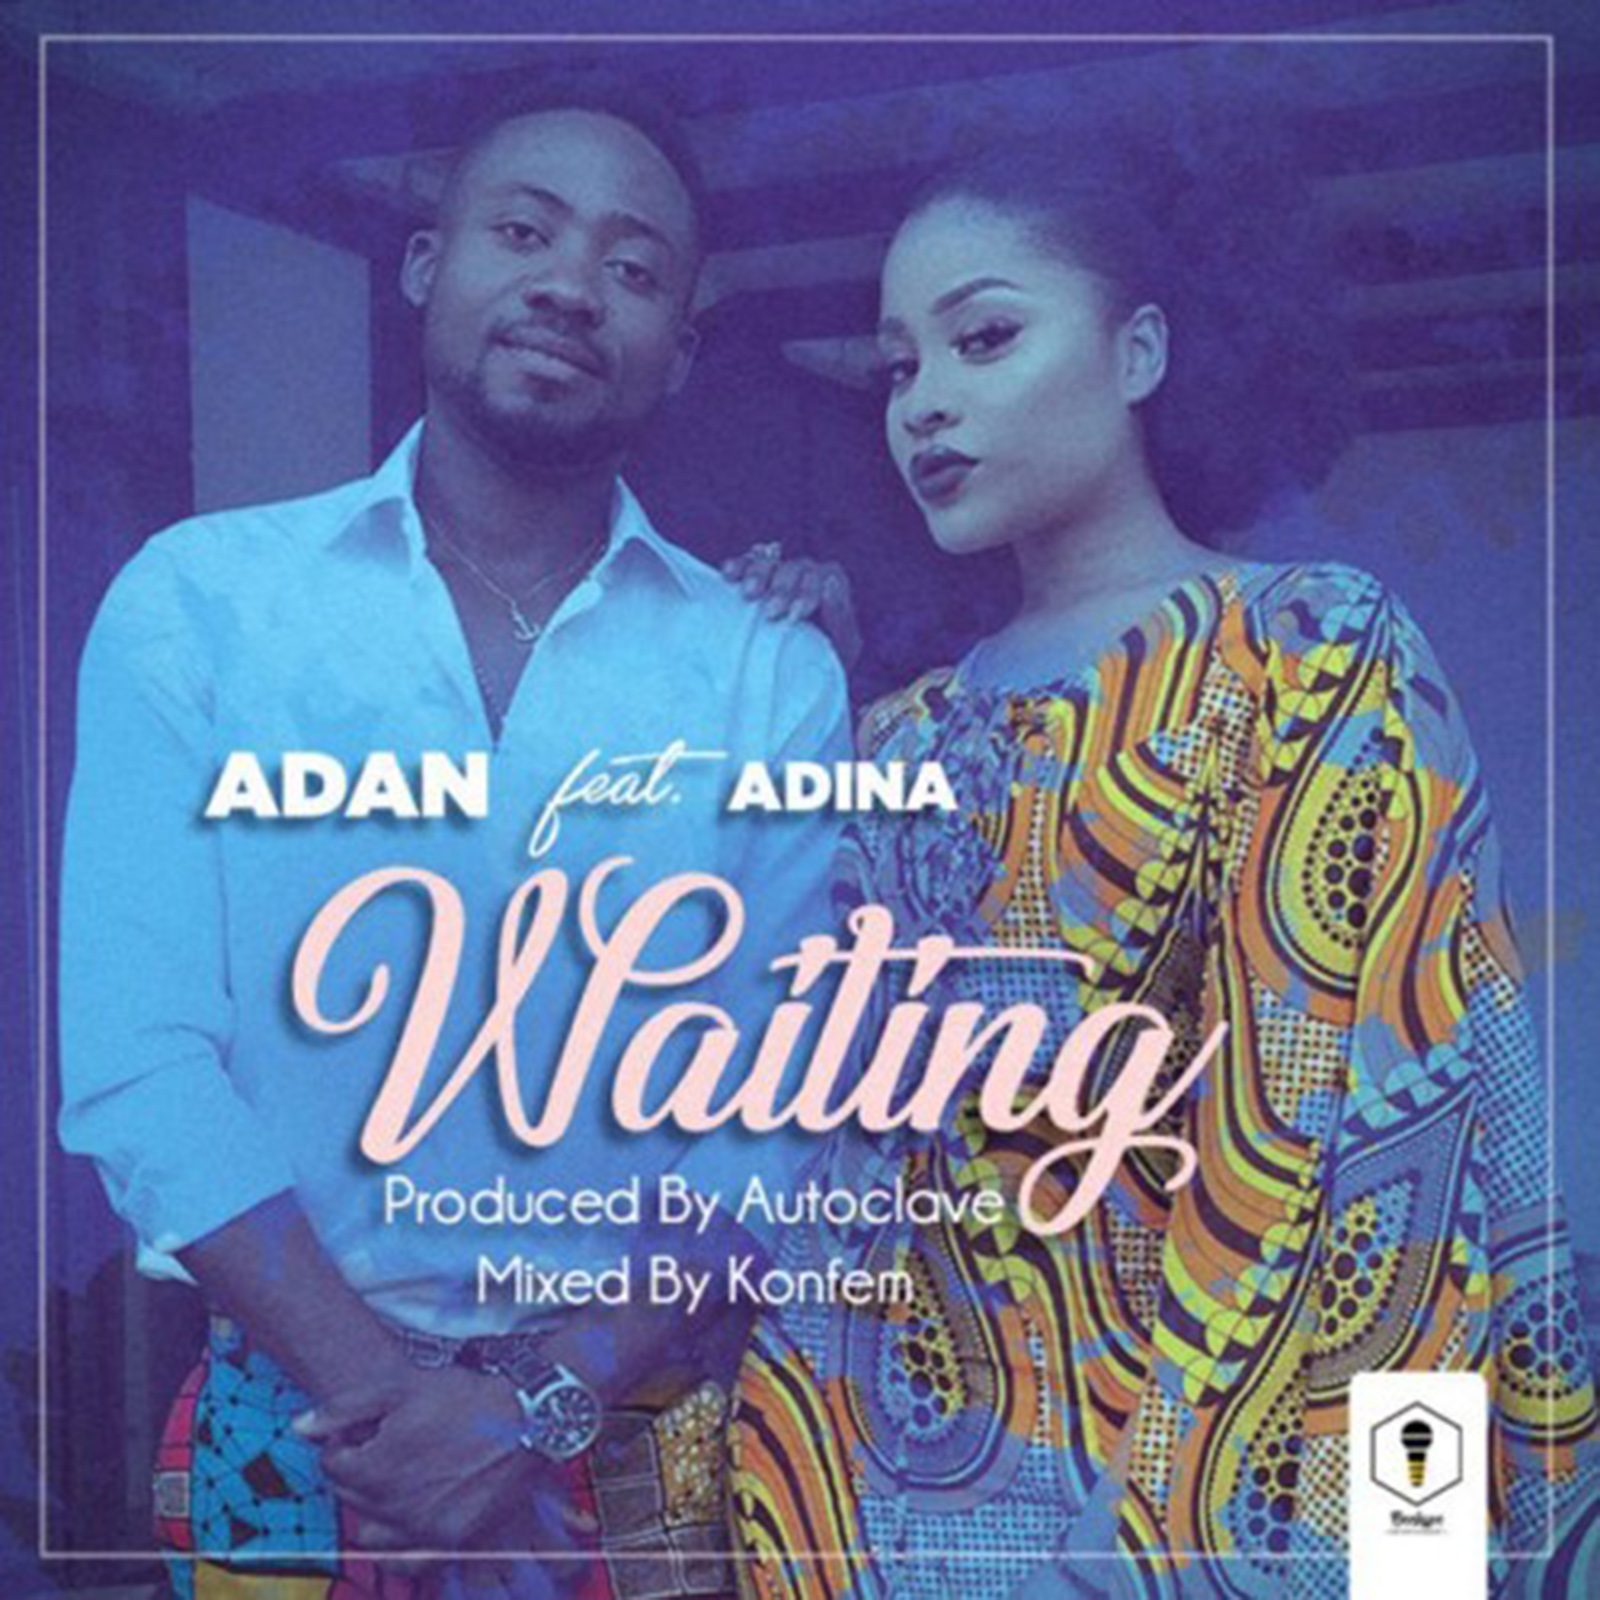 Waiting by Adan feat. Adina